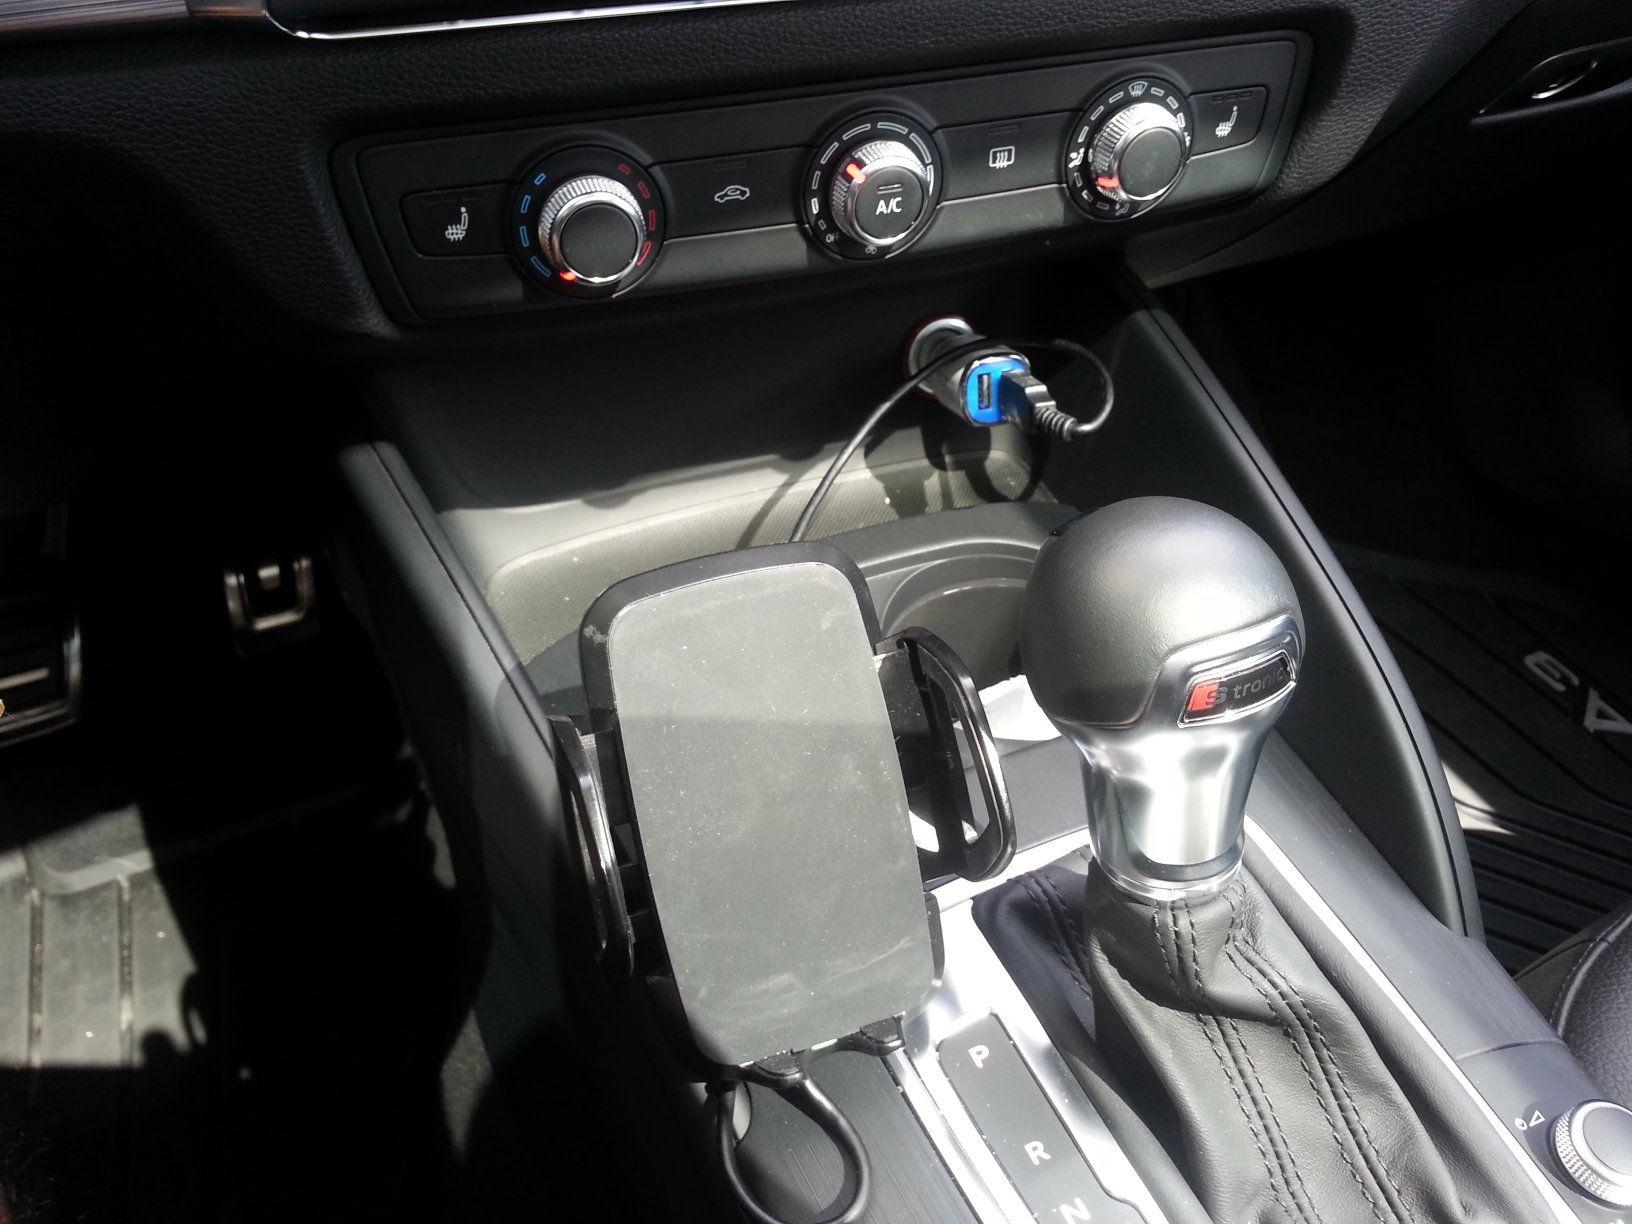 Iphone Mount AudiWorld Forums - Audi iphone 6 car mount